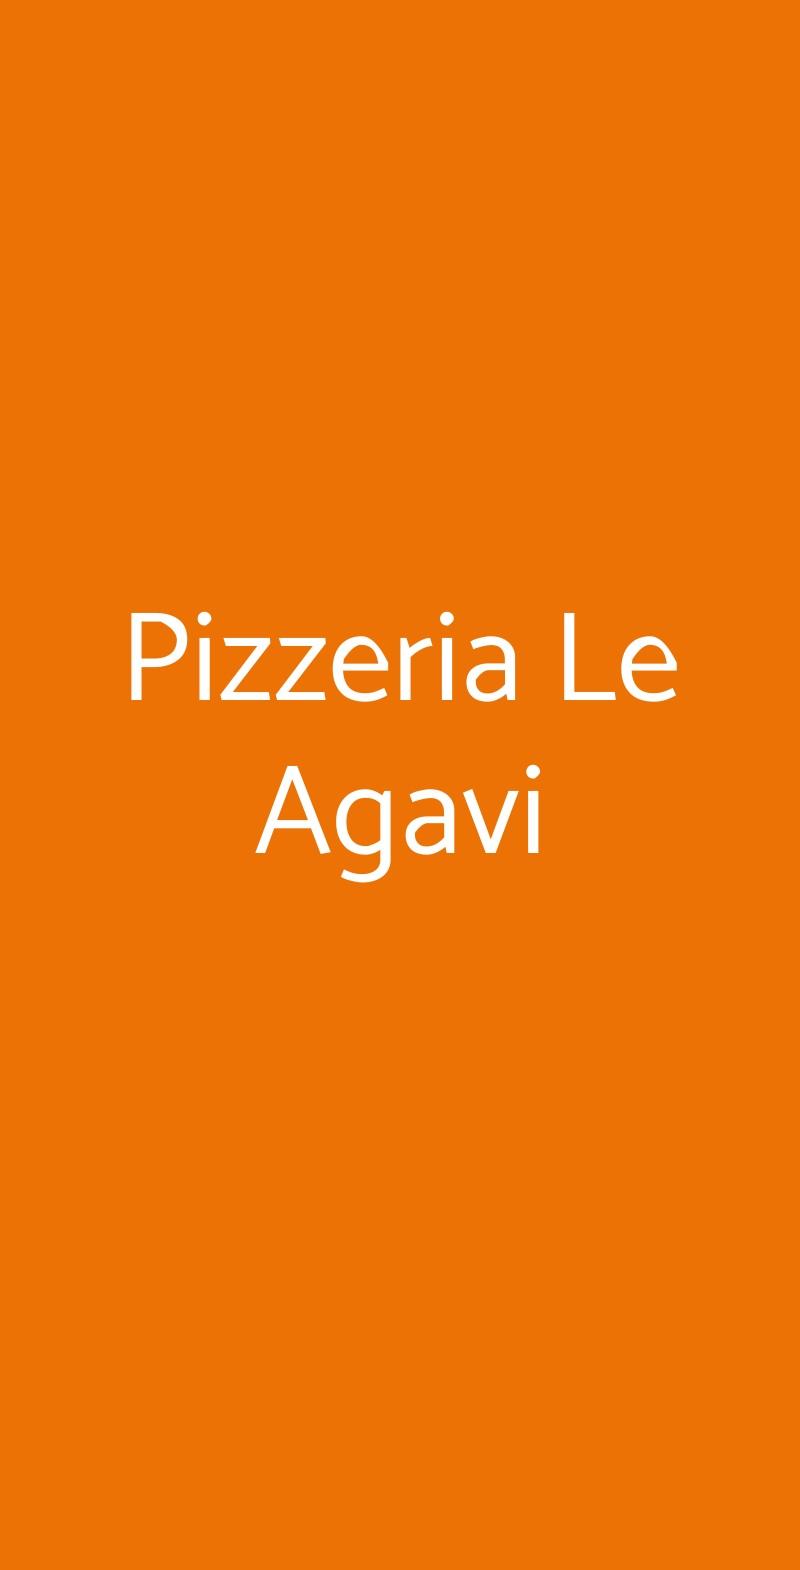 Pizzeria Le Agavi Trieste menù 1 pagina